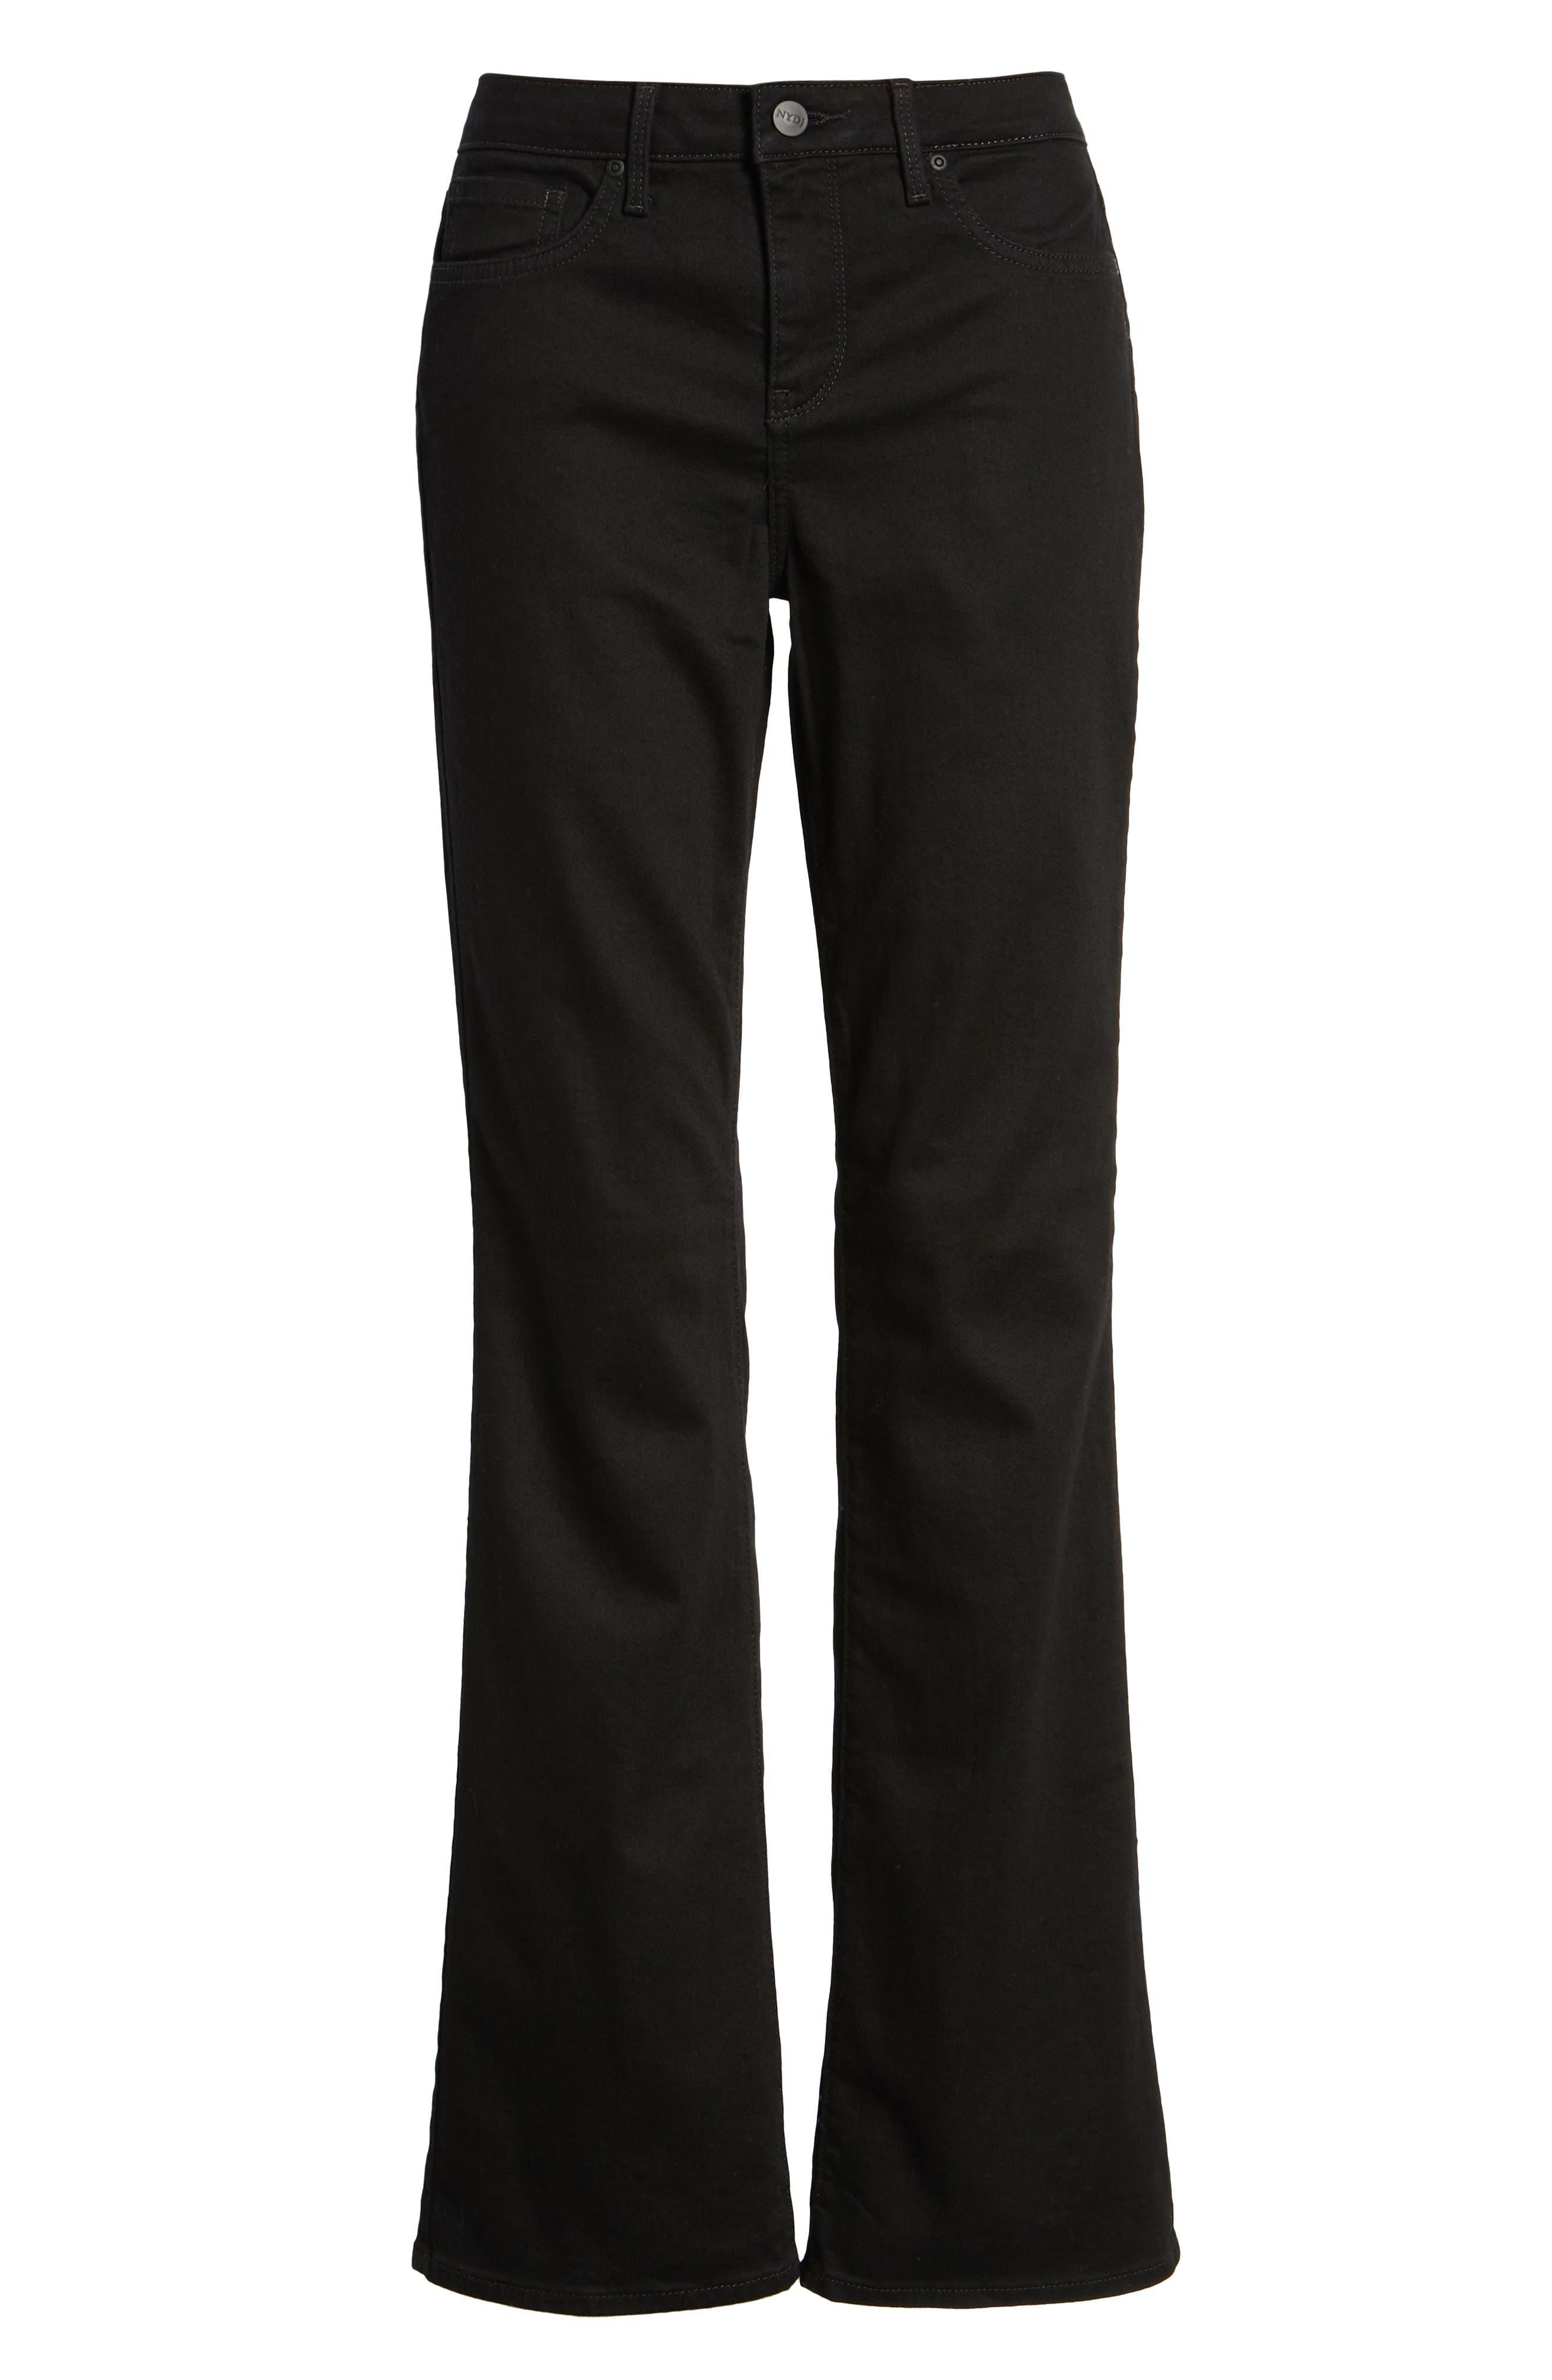 Barbara High Waist Stretch Bootcut Jeans,                             Alternate thumbnail 4, color,                             BLACK